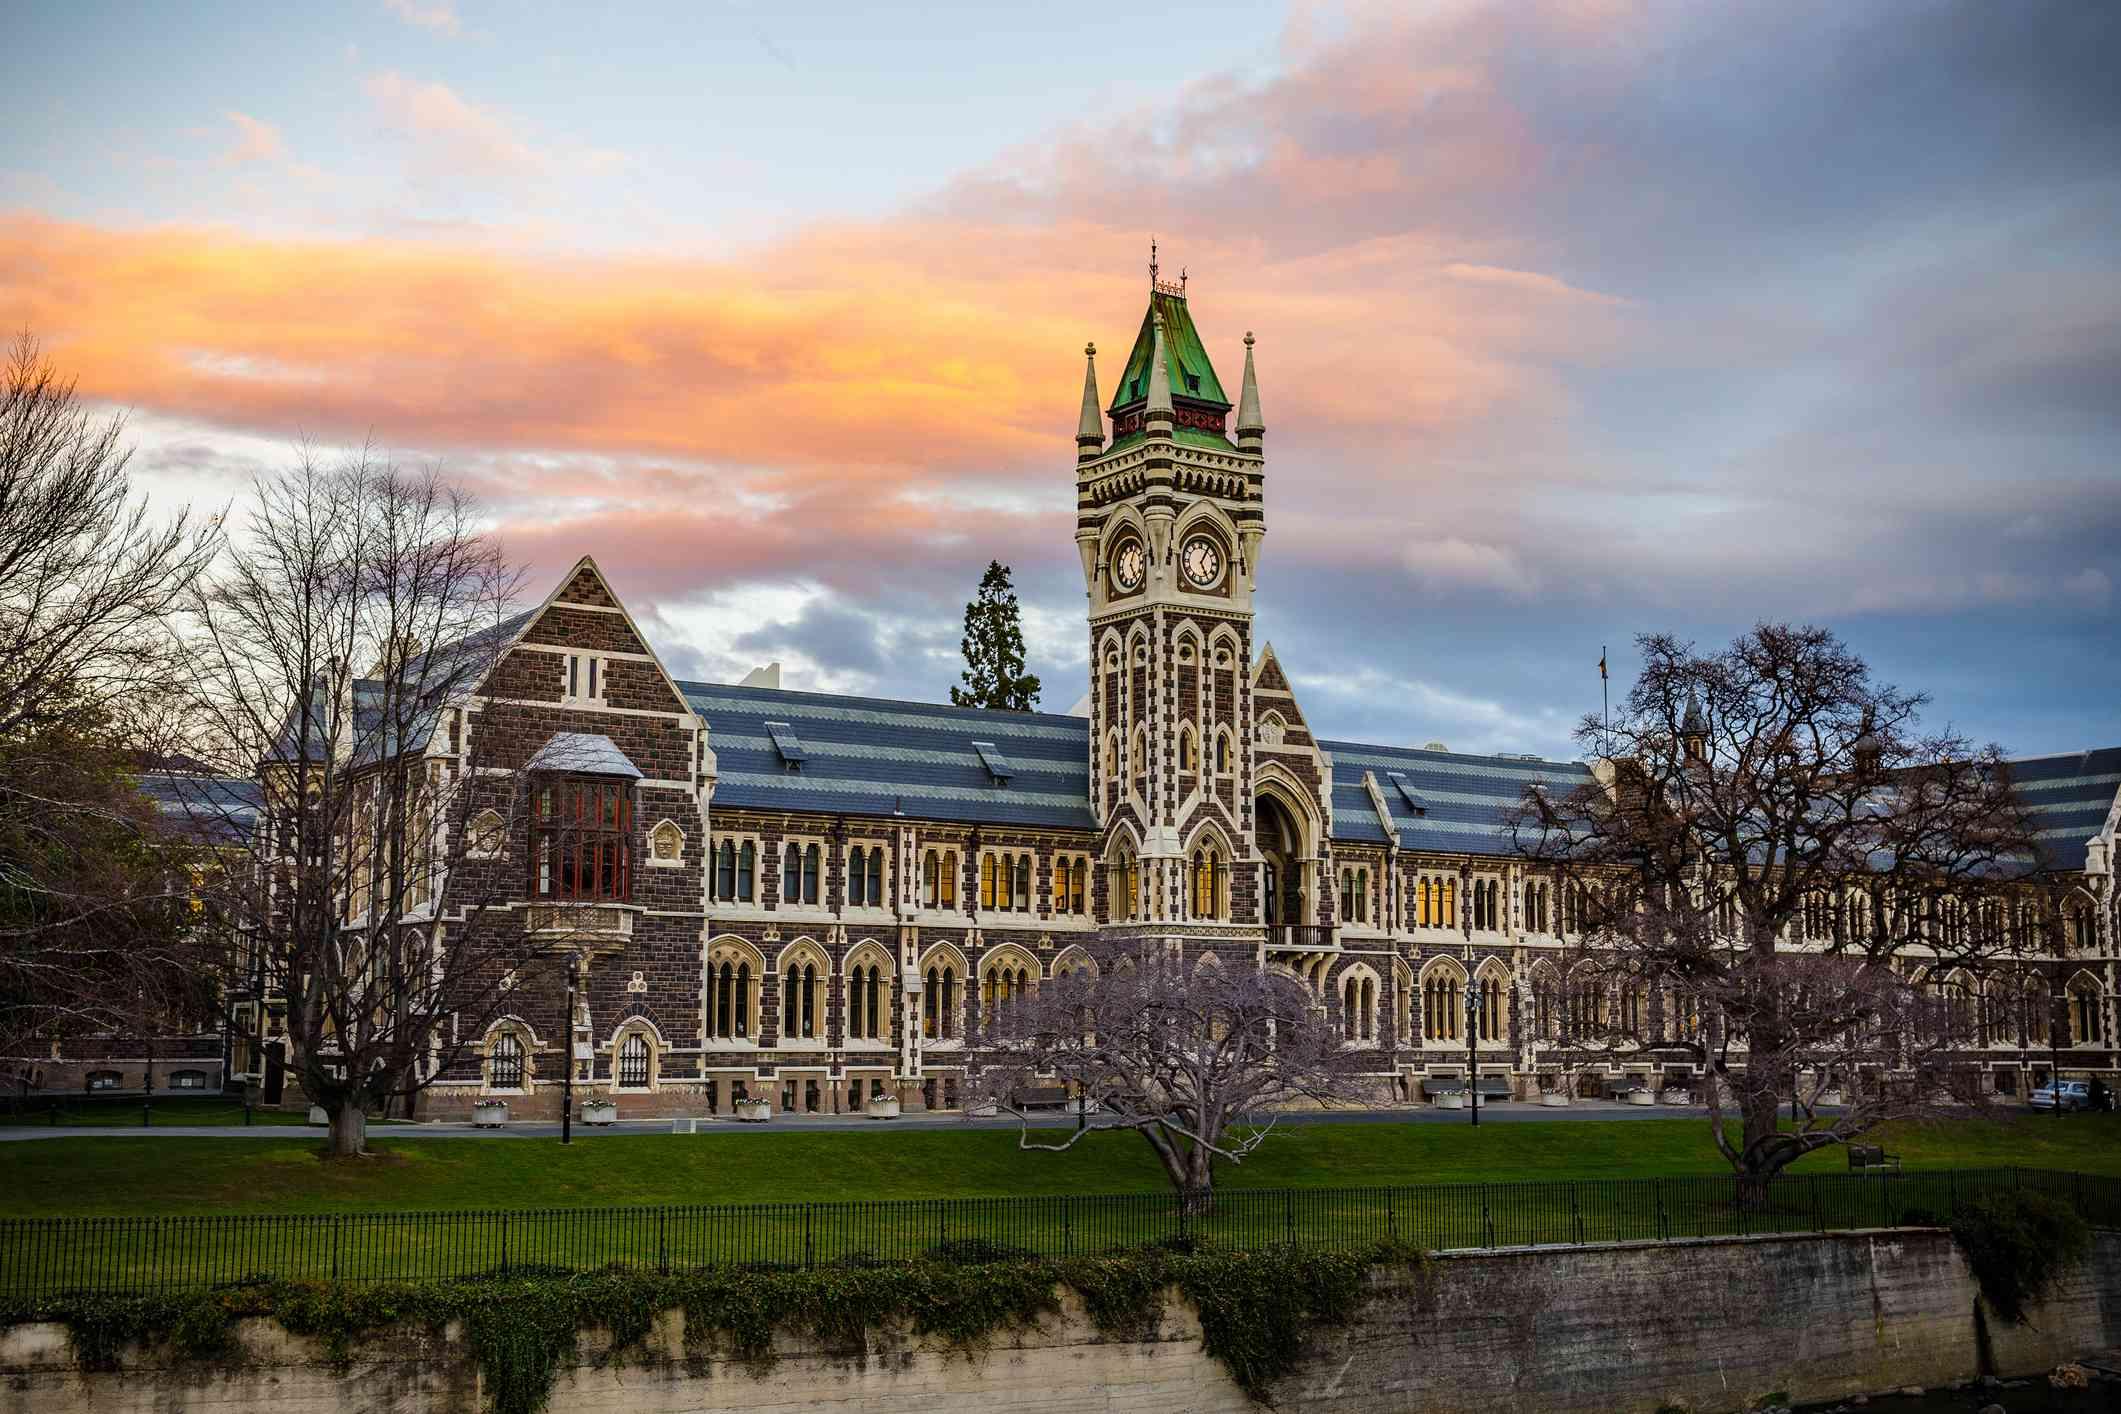 Neo-gothic stone clocktower at the University of Otago